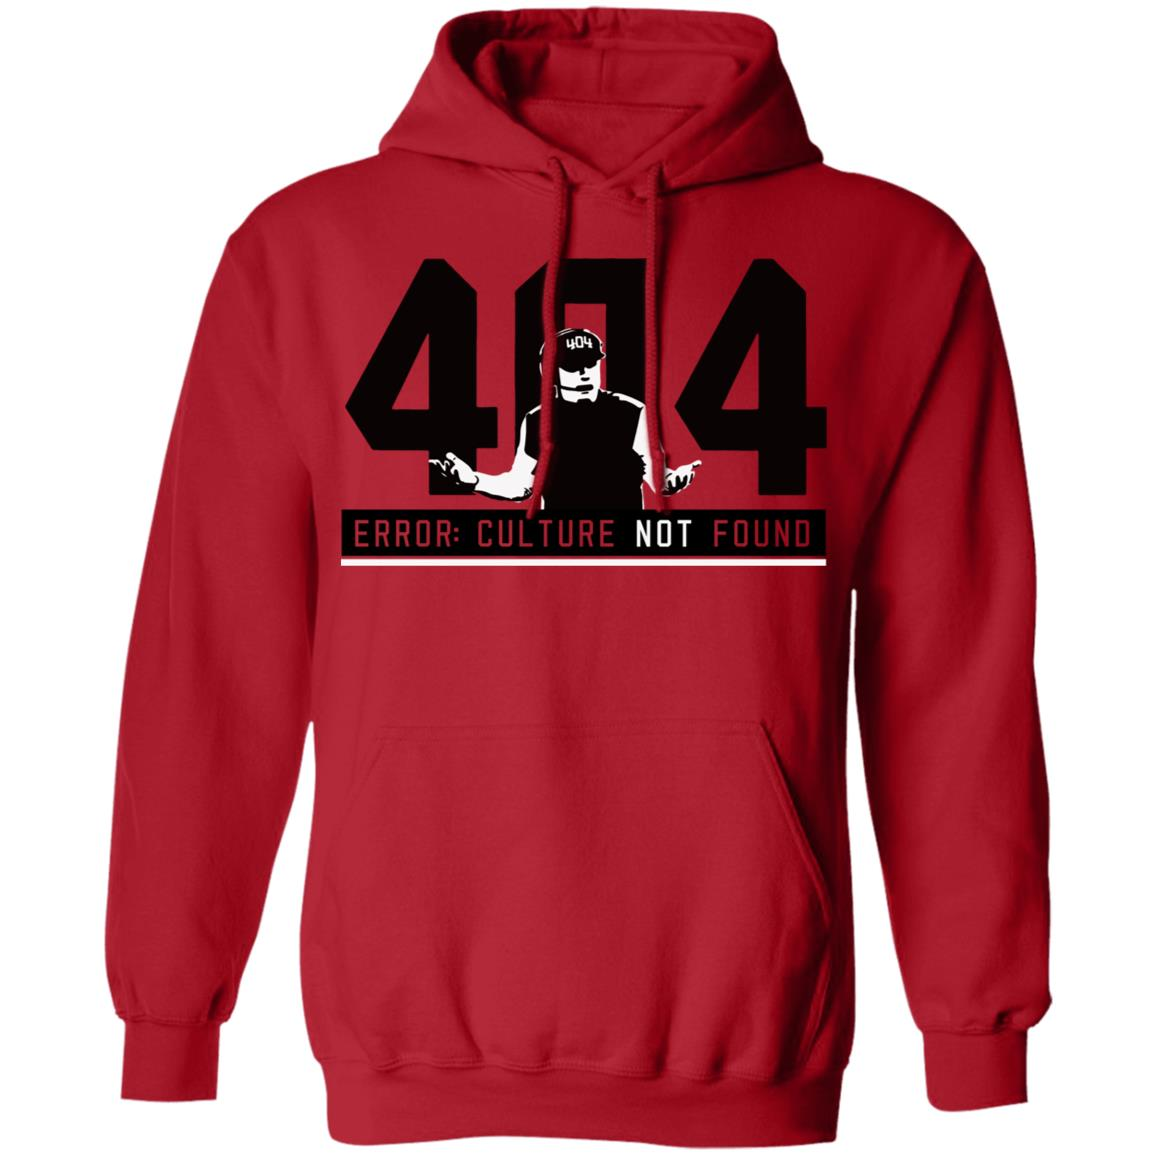 G185 Pullover Hoodie 8 oz.